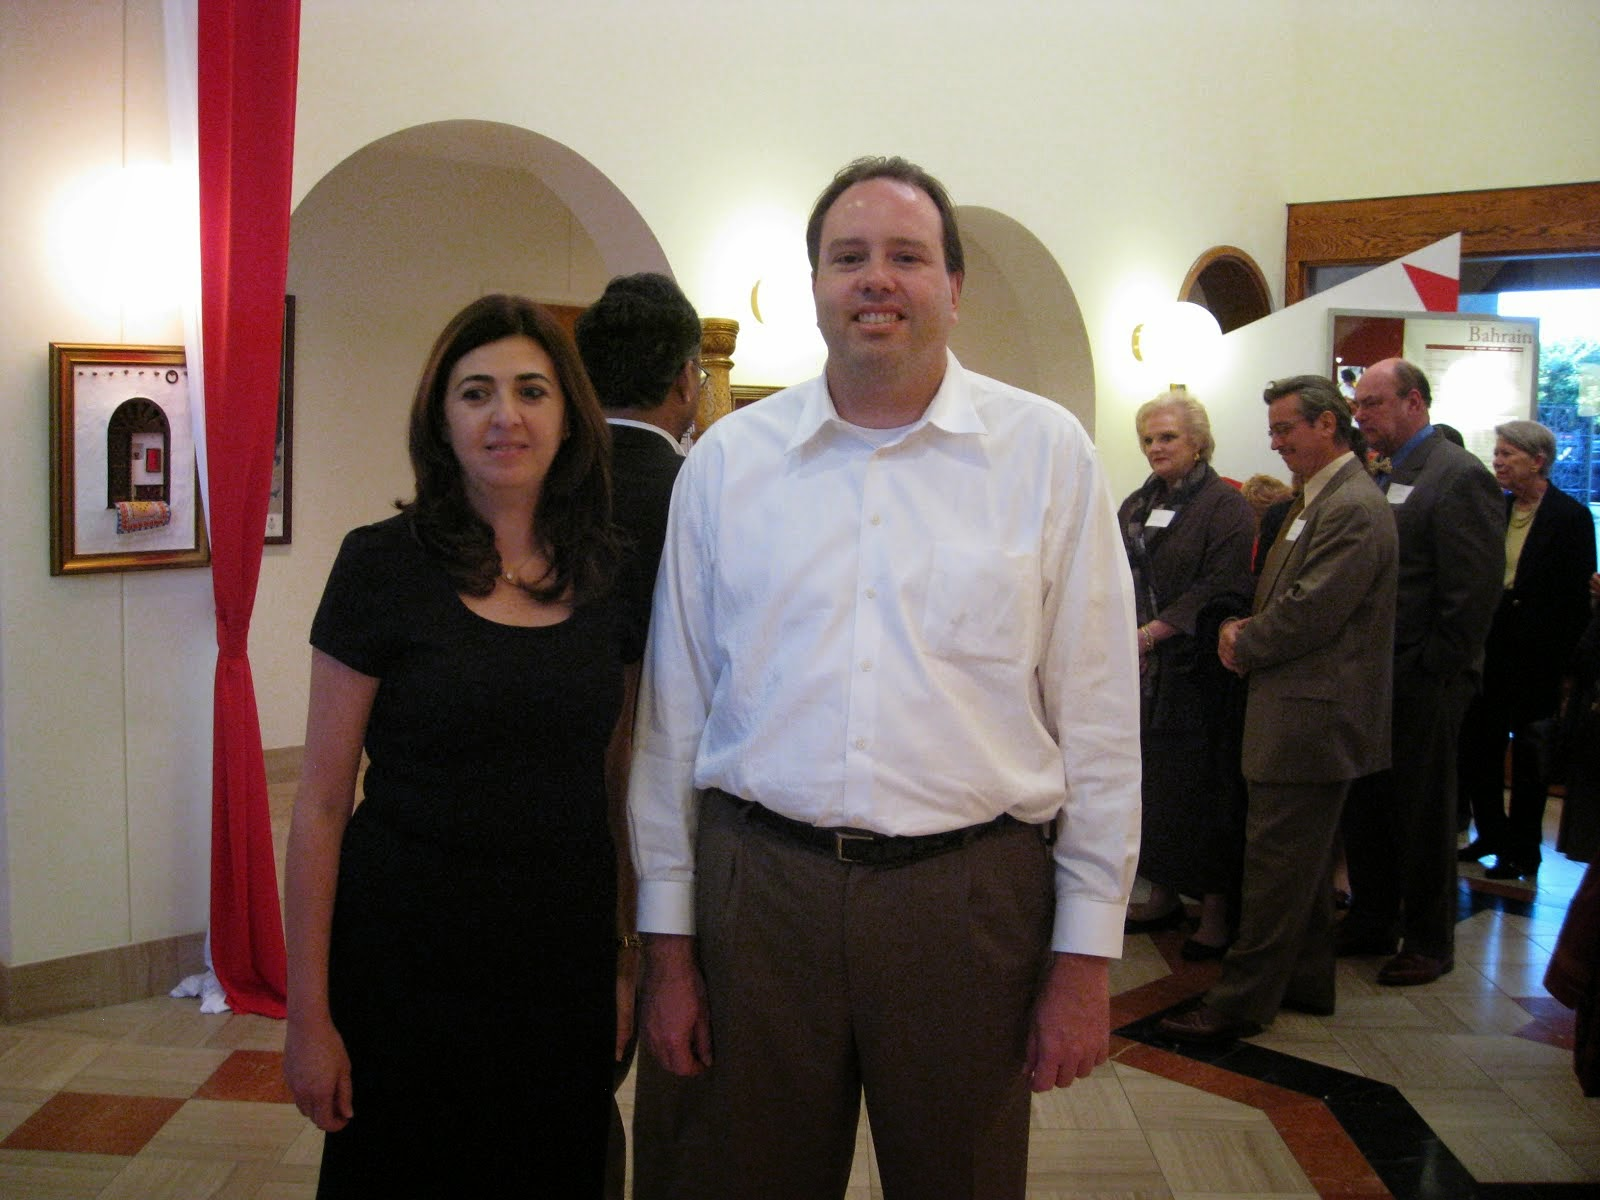 Ralph Winnie Jr. With the Ambassador of Bahrain, October 2009